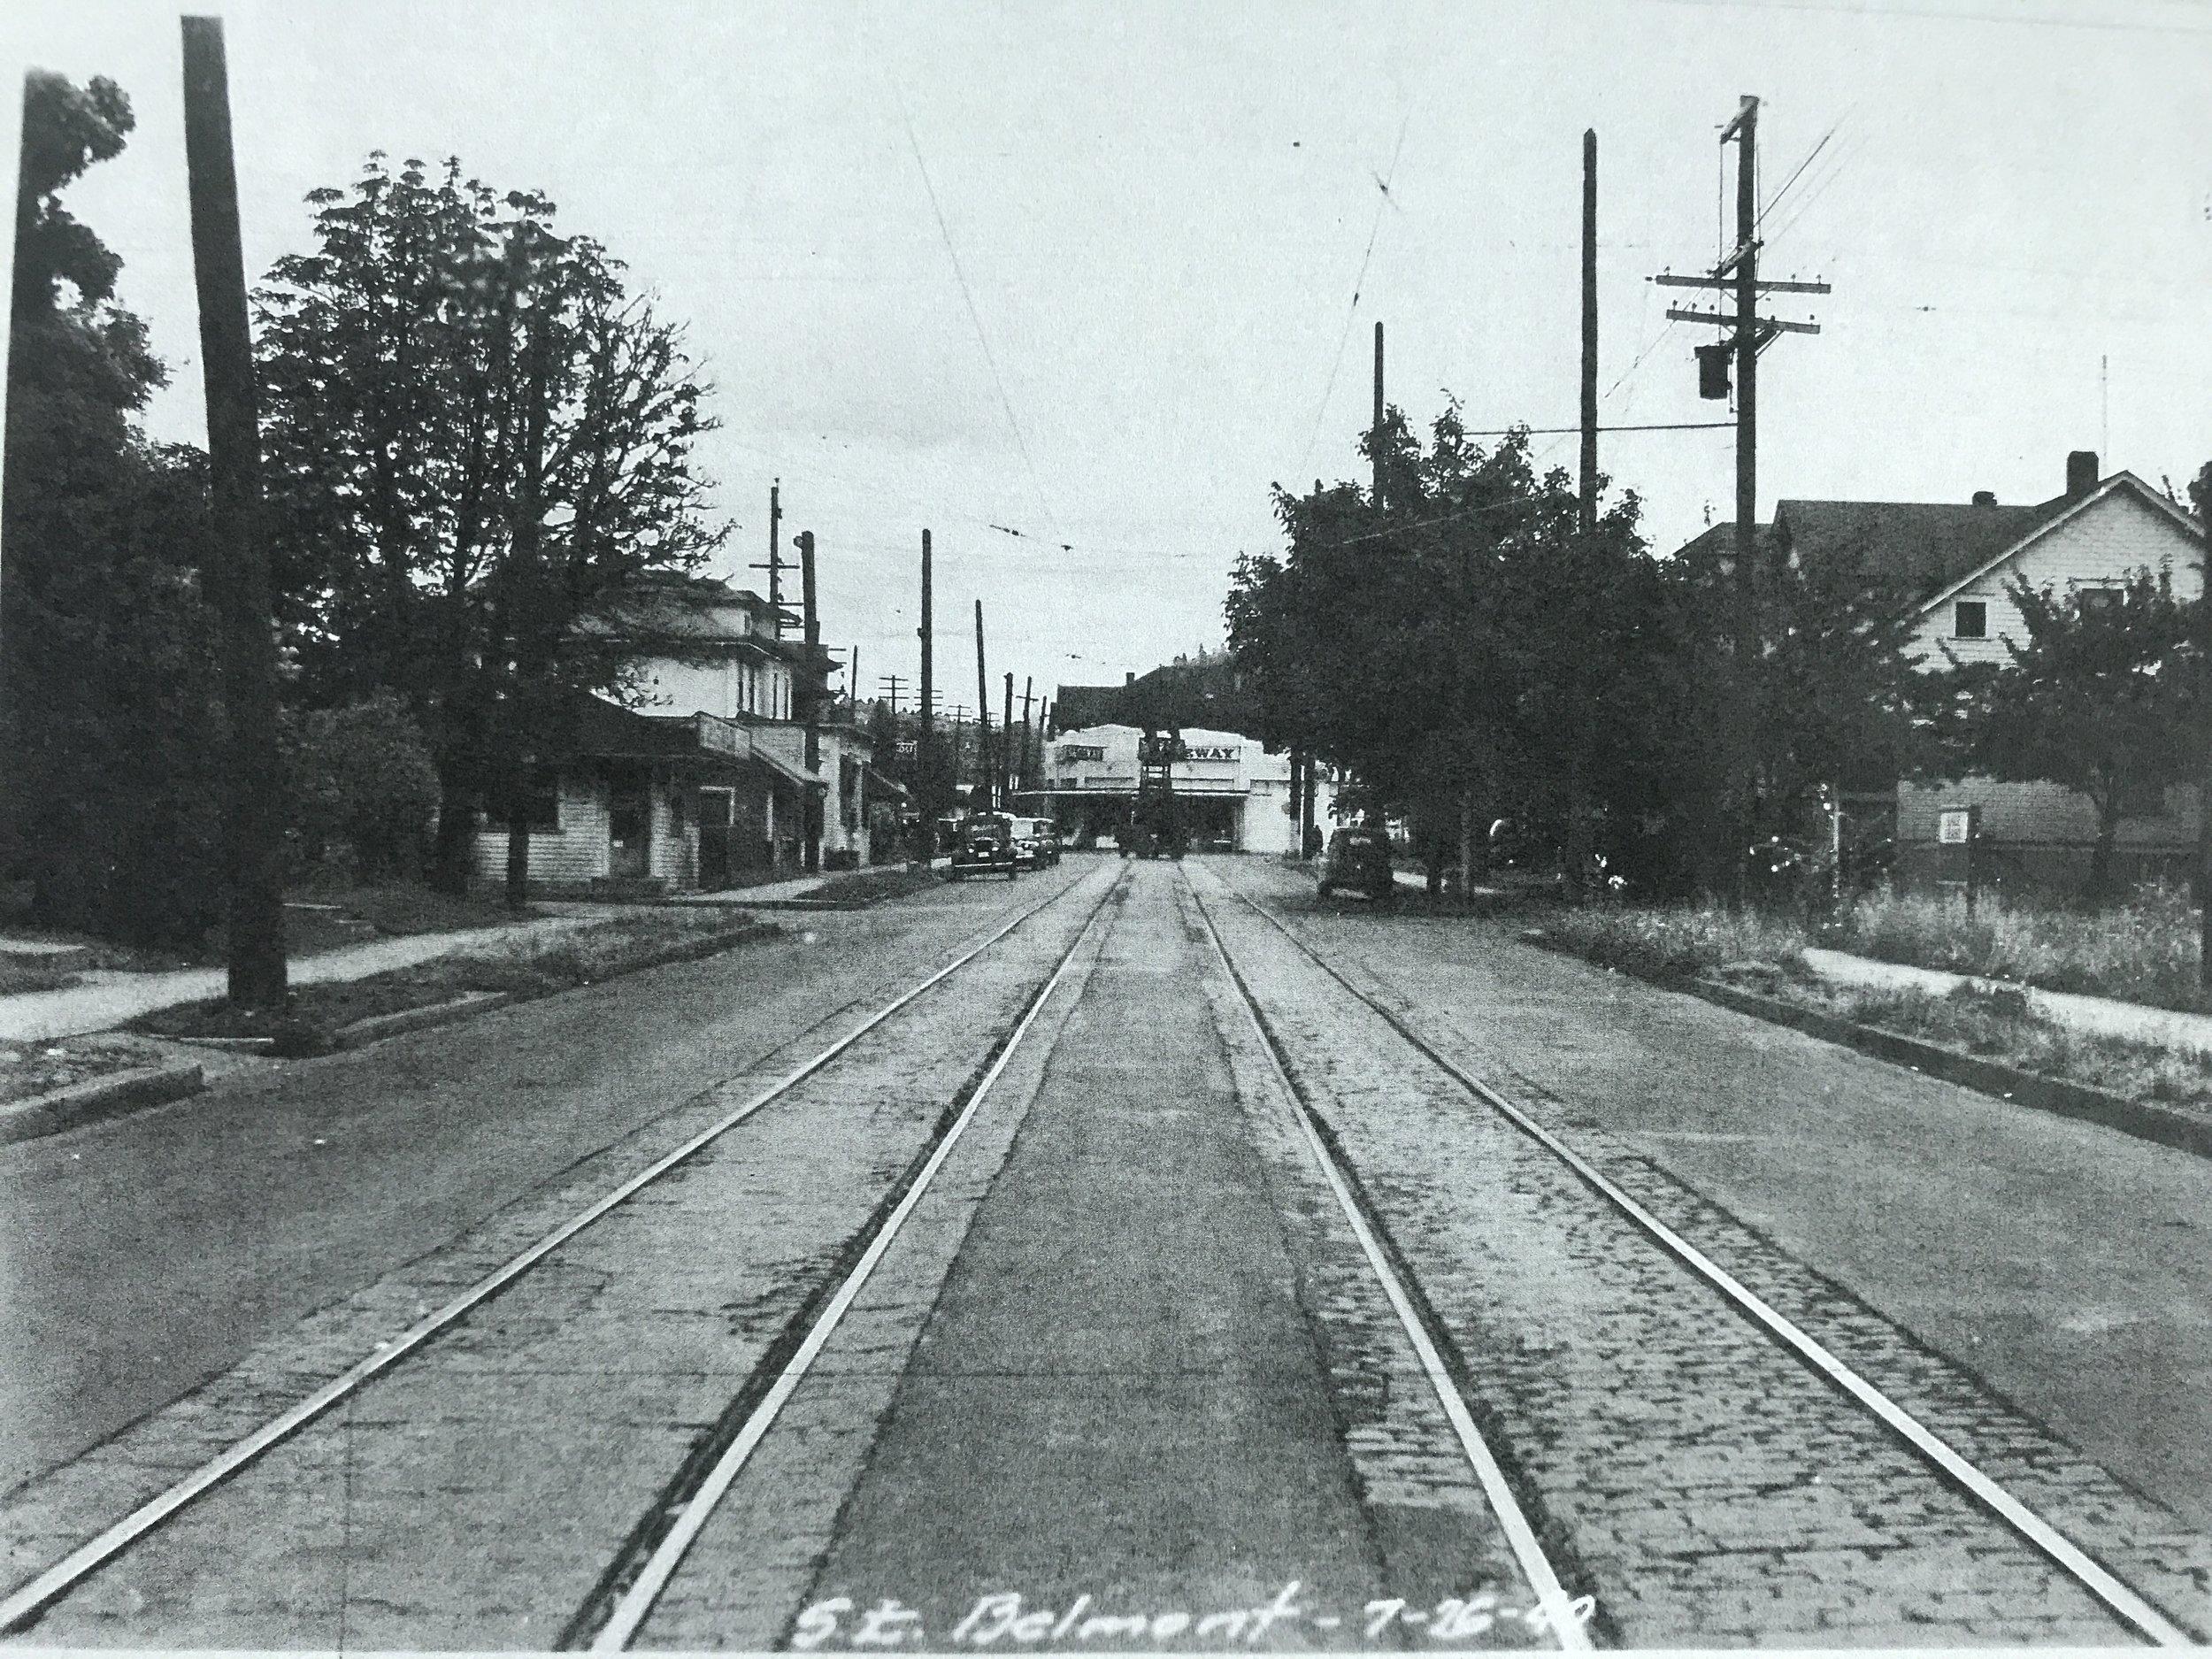 39th & Belmont, 1940